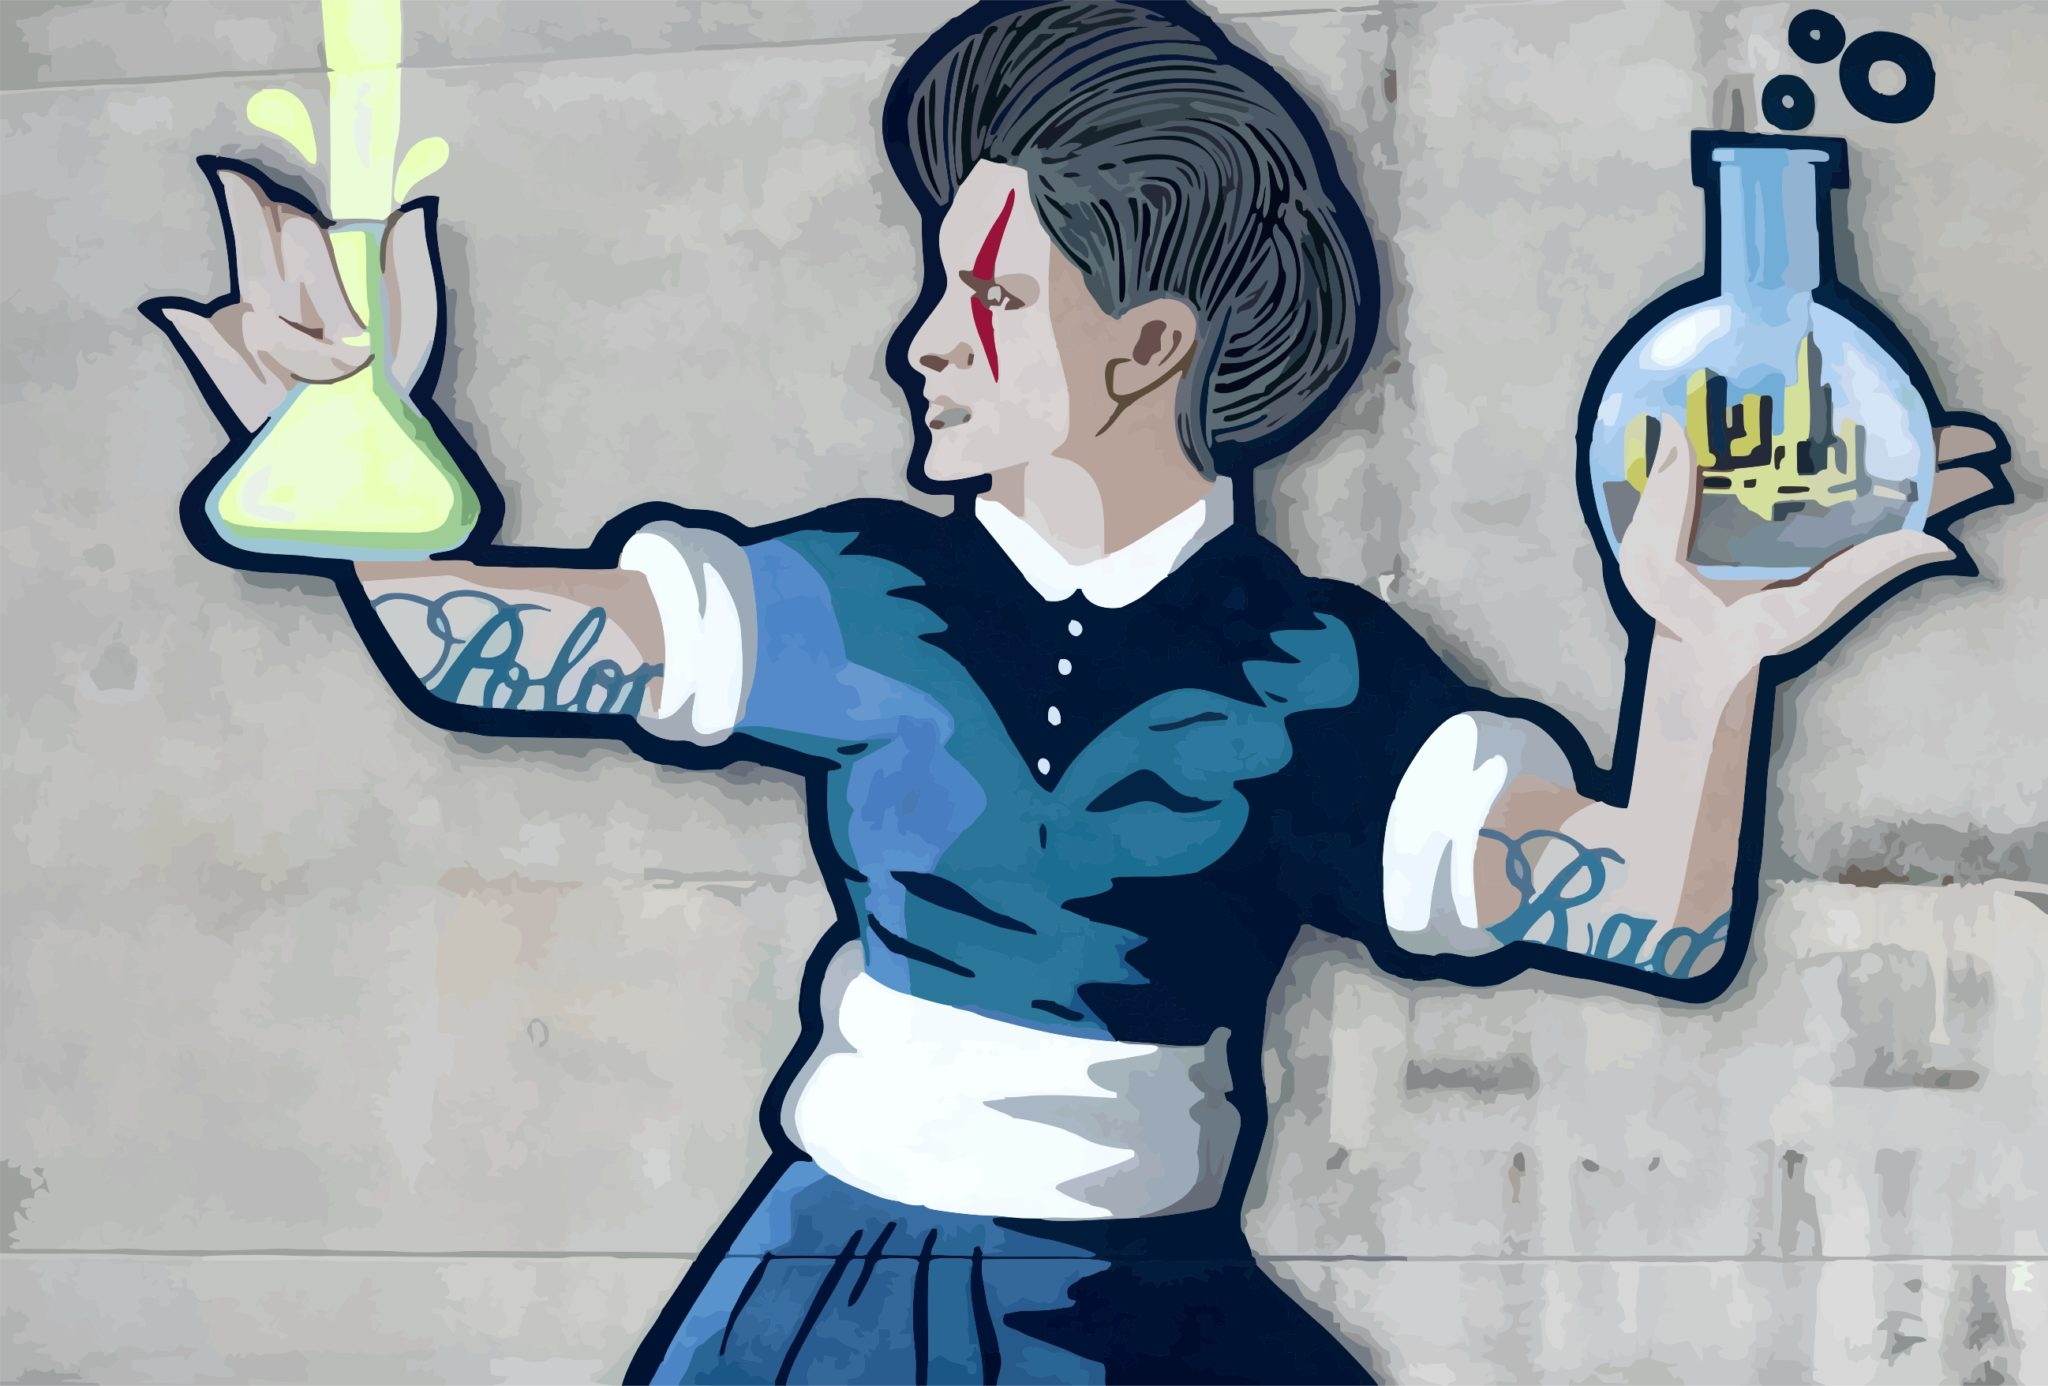 Marie Curie Mural in Warsaw